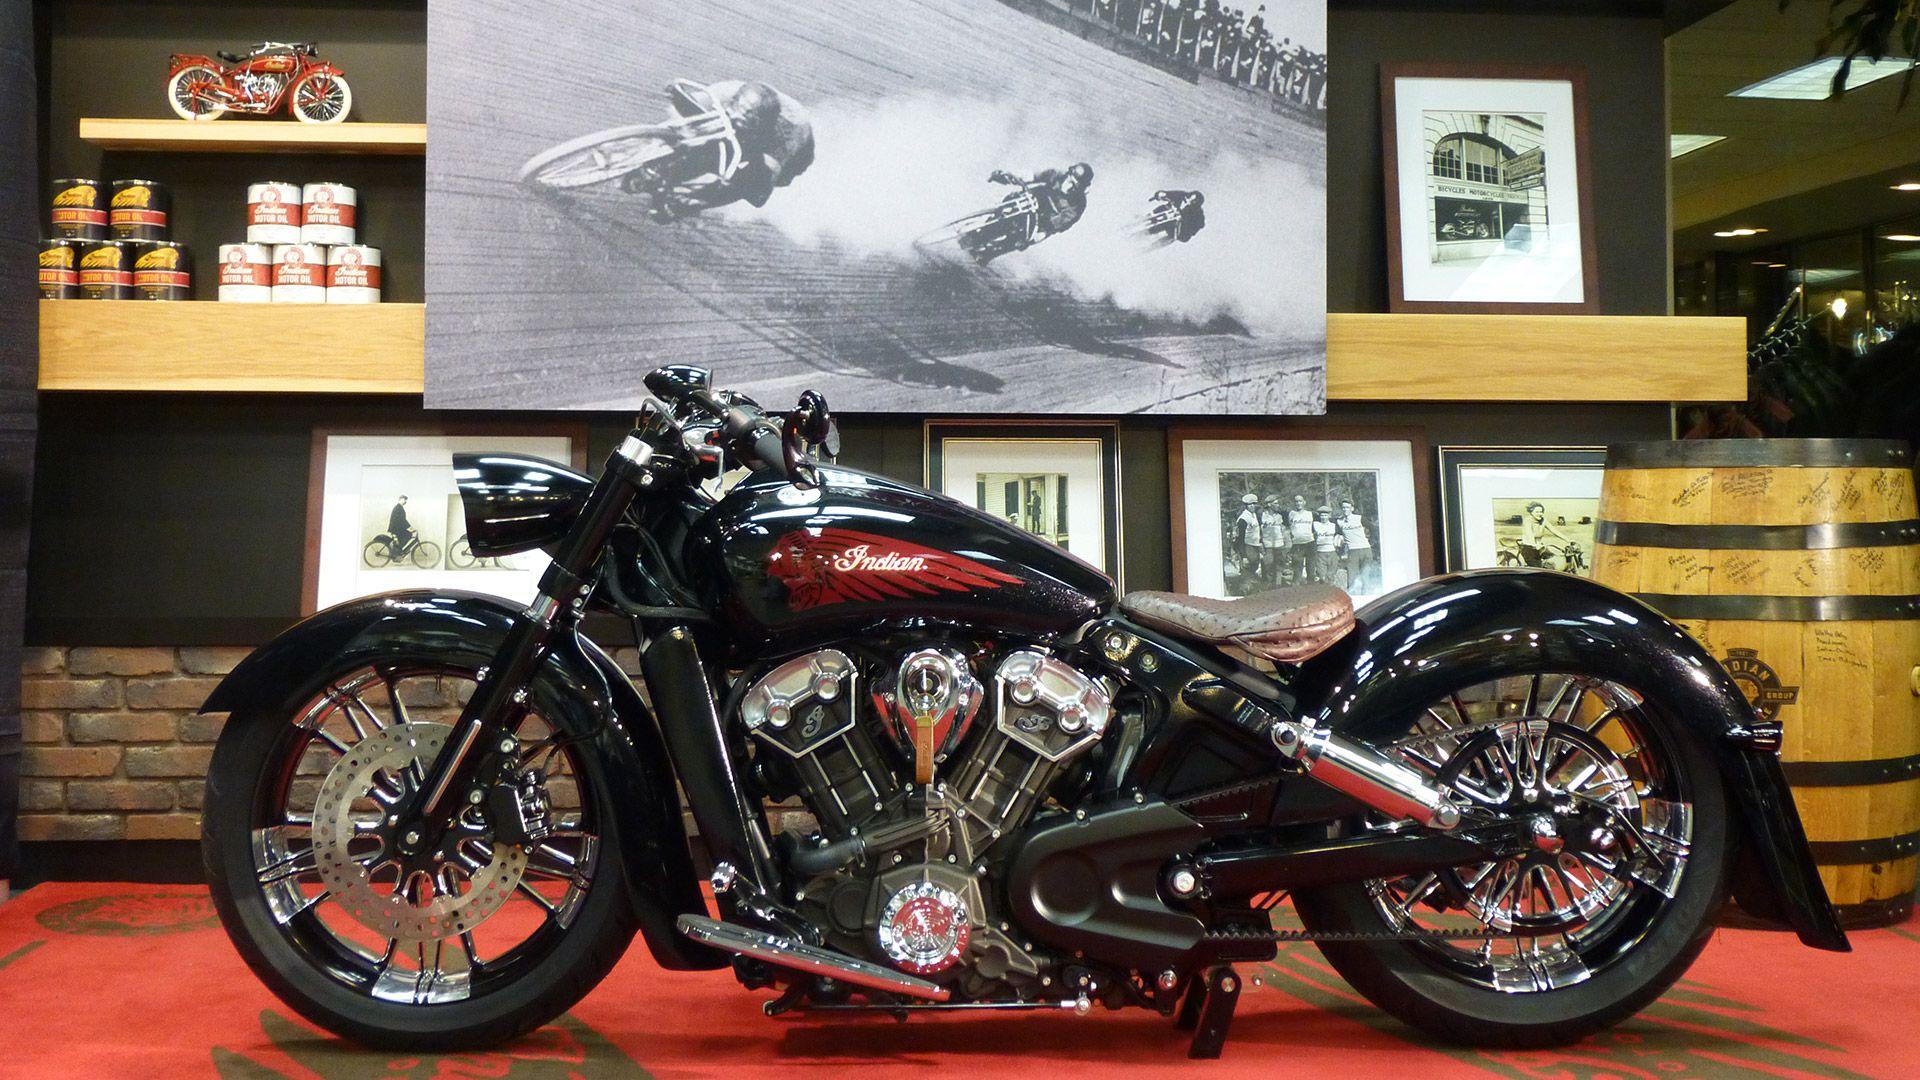 legend motorcycles repairing l.l.c